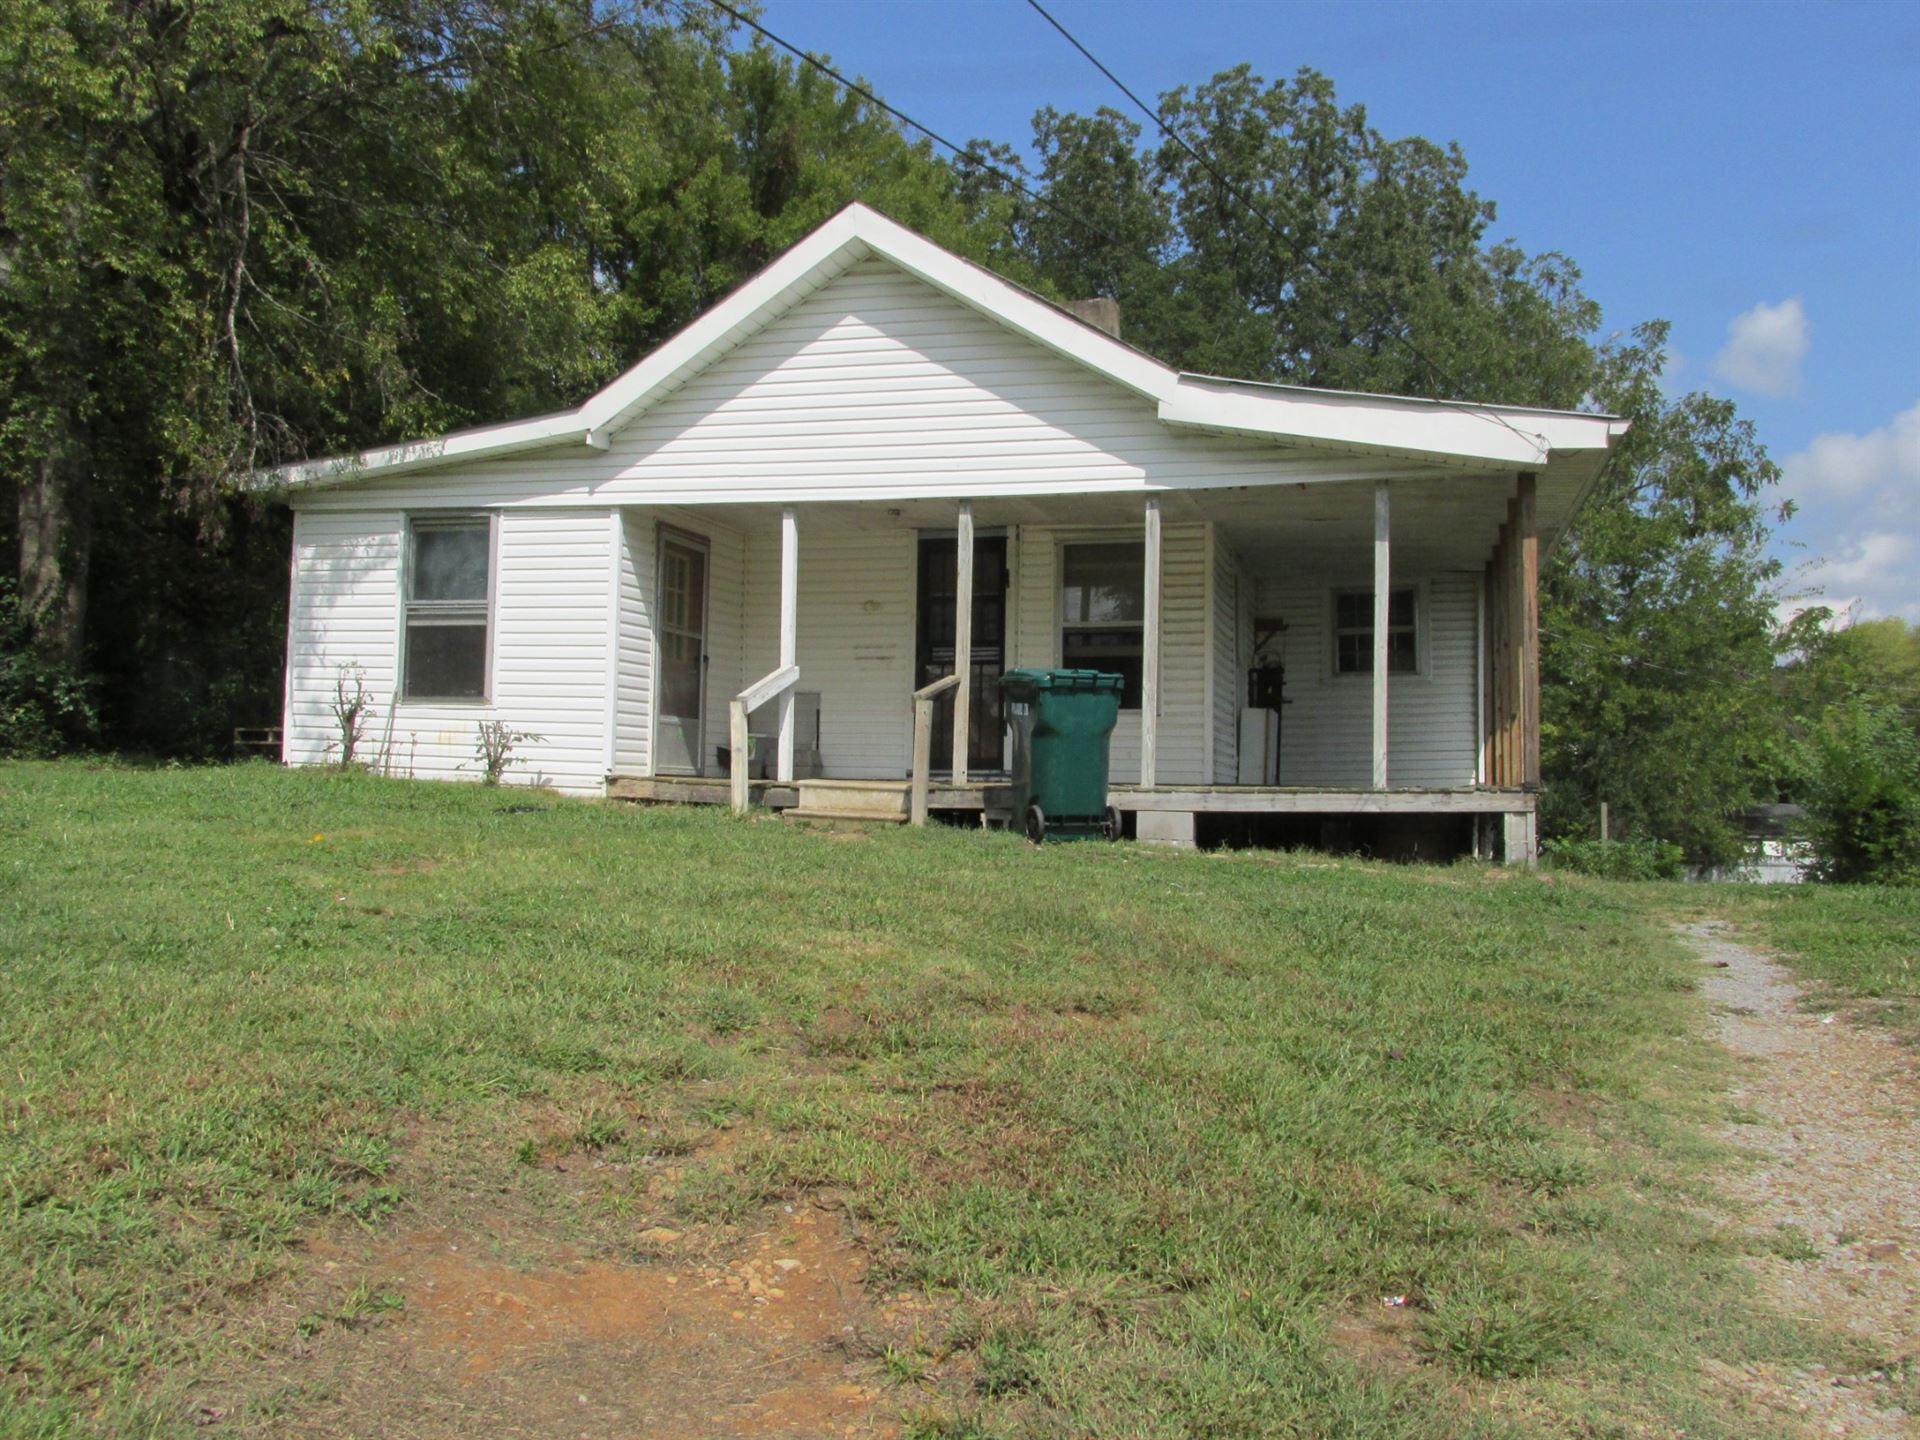 654 E Jefferson St, Pulaski, TN 38478 - MLS#: 2193397